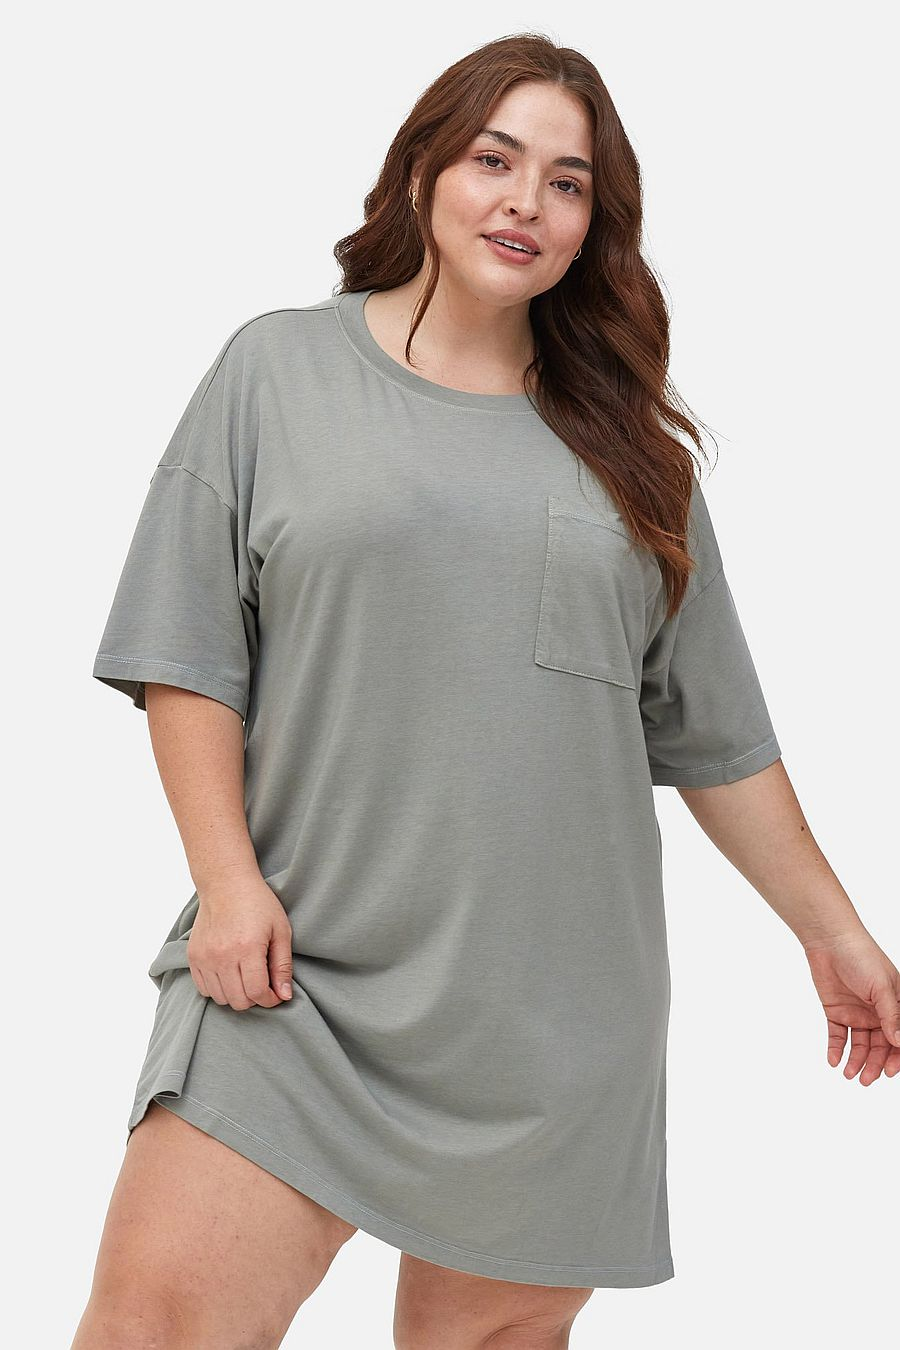 MATE The Label Tencel Sleep Tee Dress - SAGE